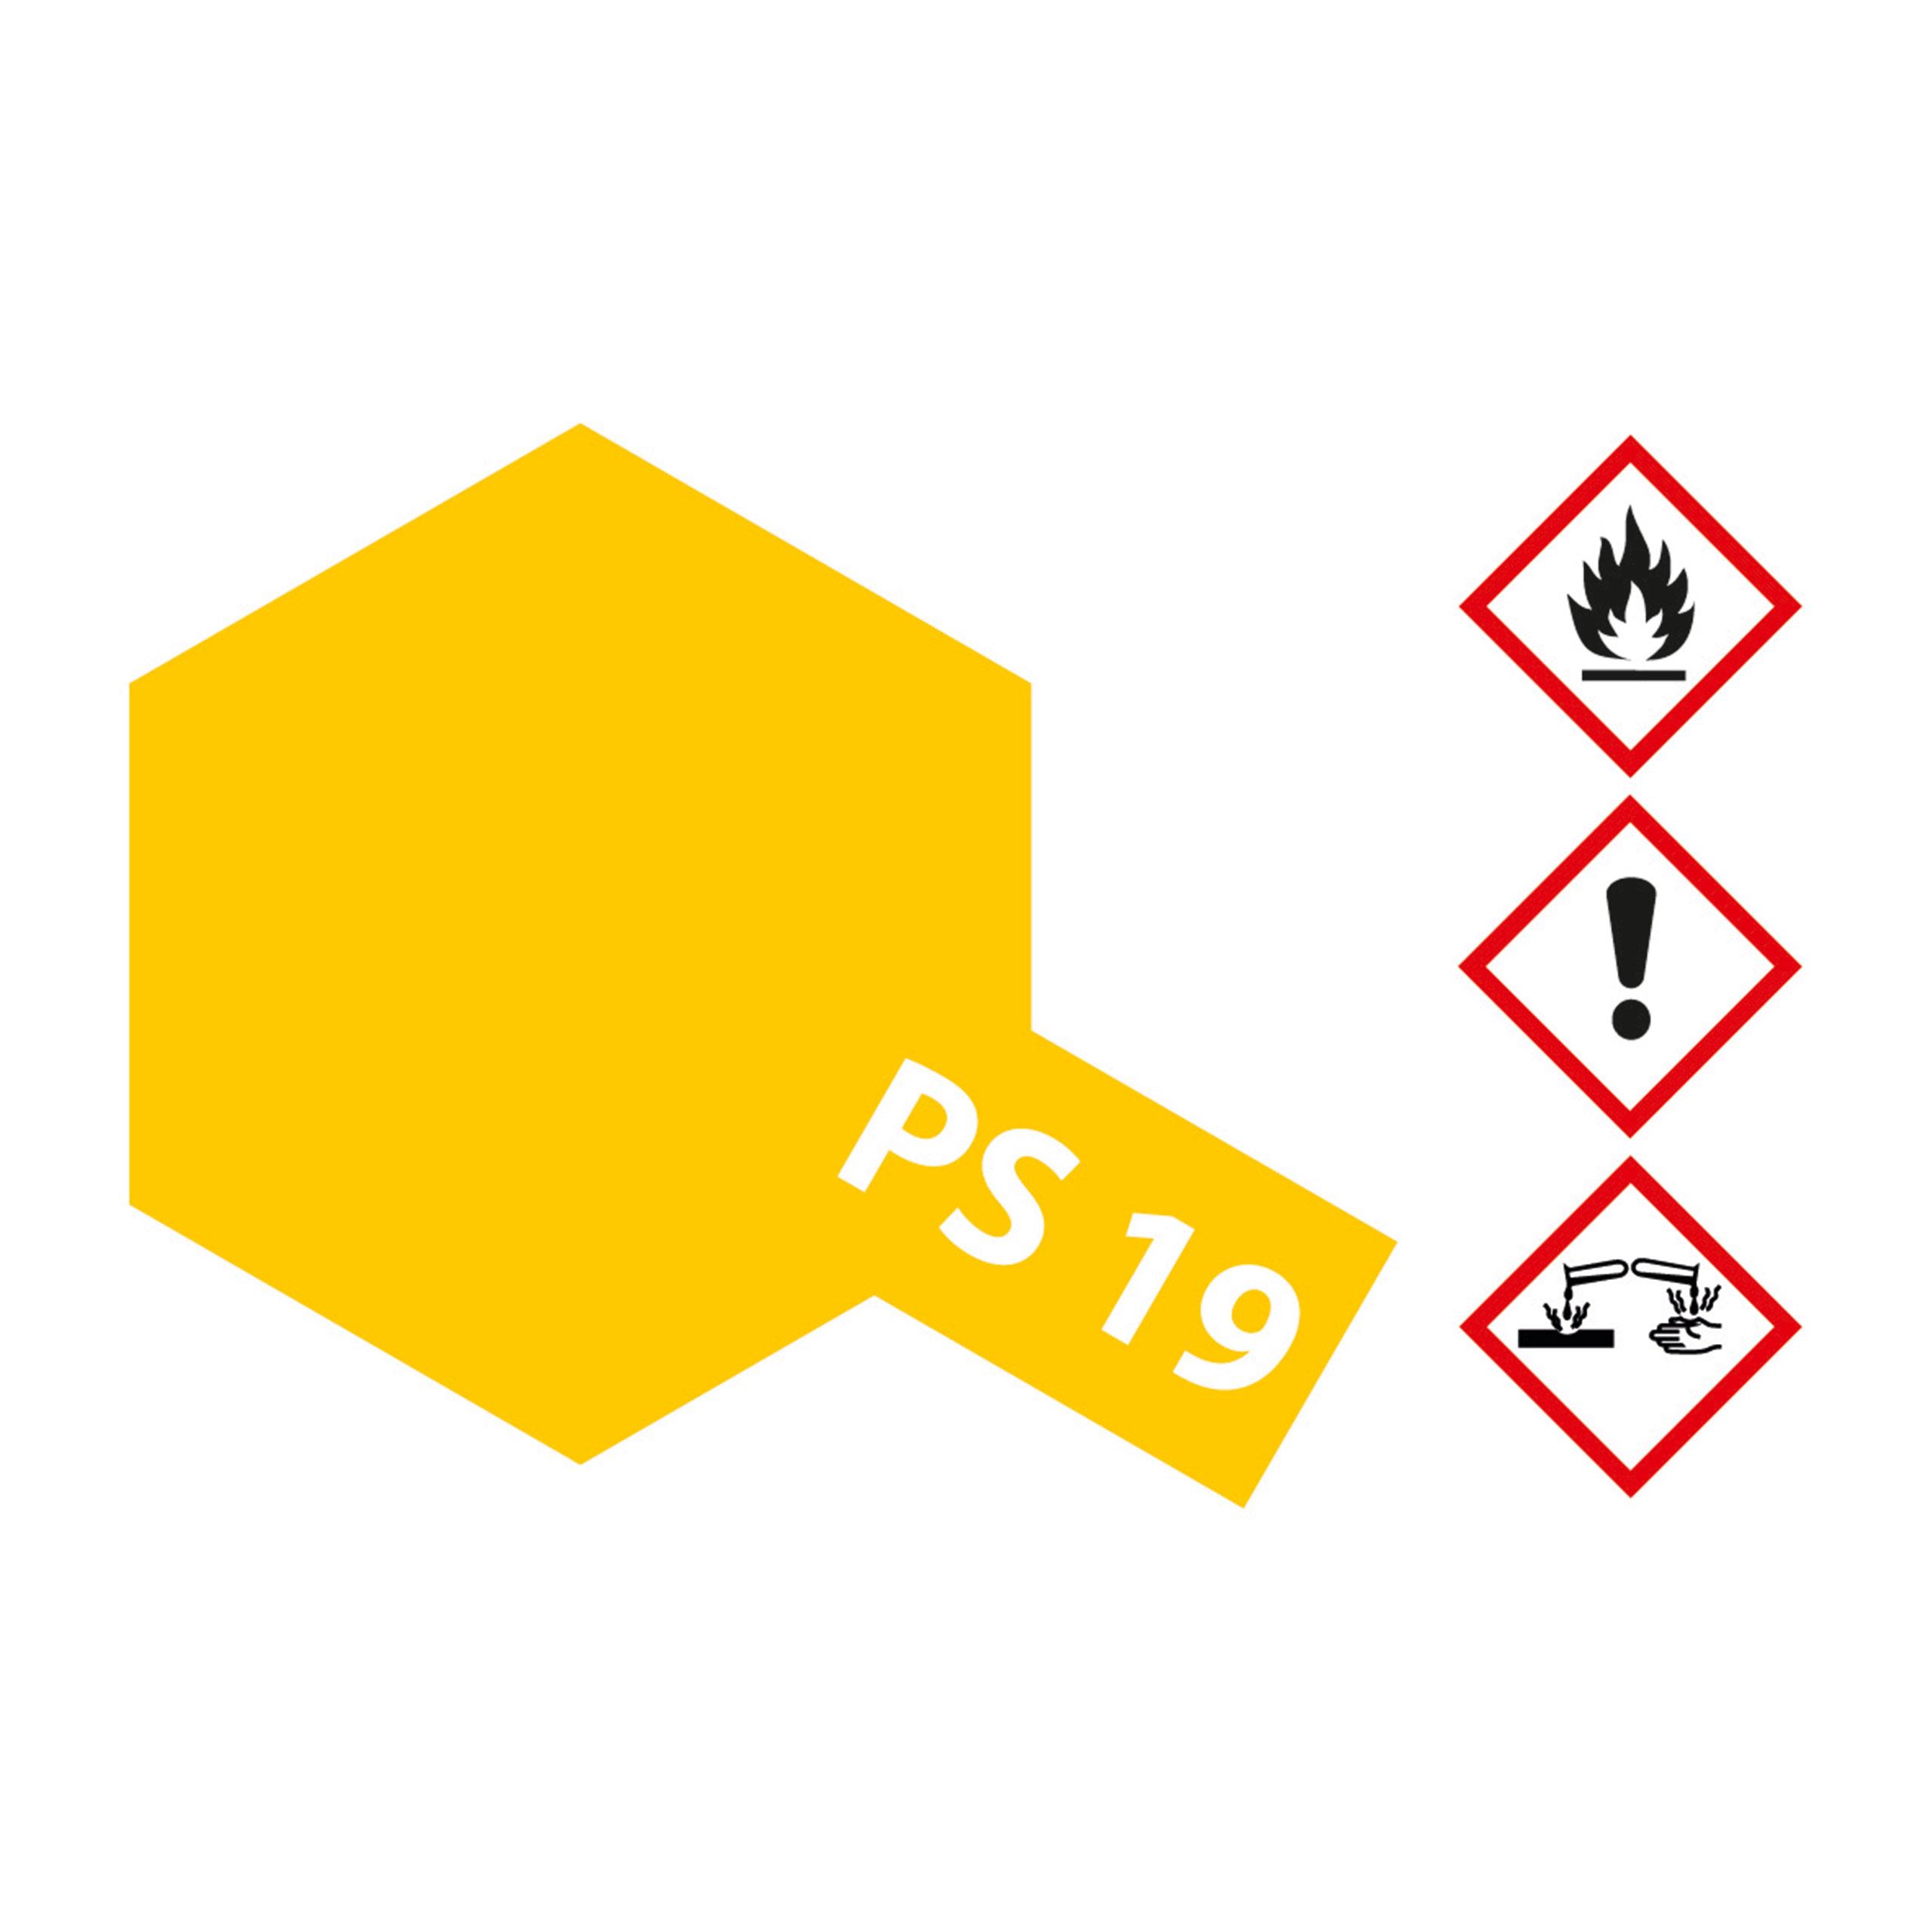 PS-19 Camelgelb Polycarbonat - 100ml Sprayfarbe Lexan - Tamiya 300086019